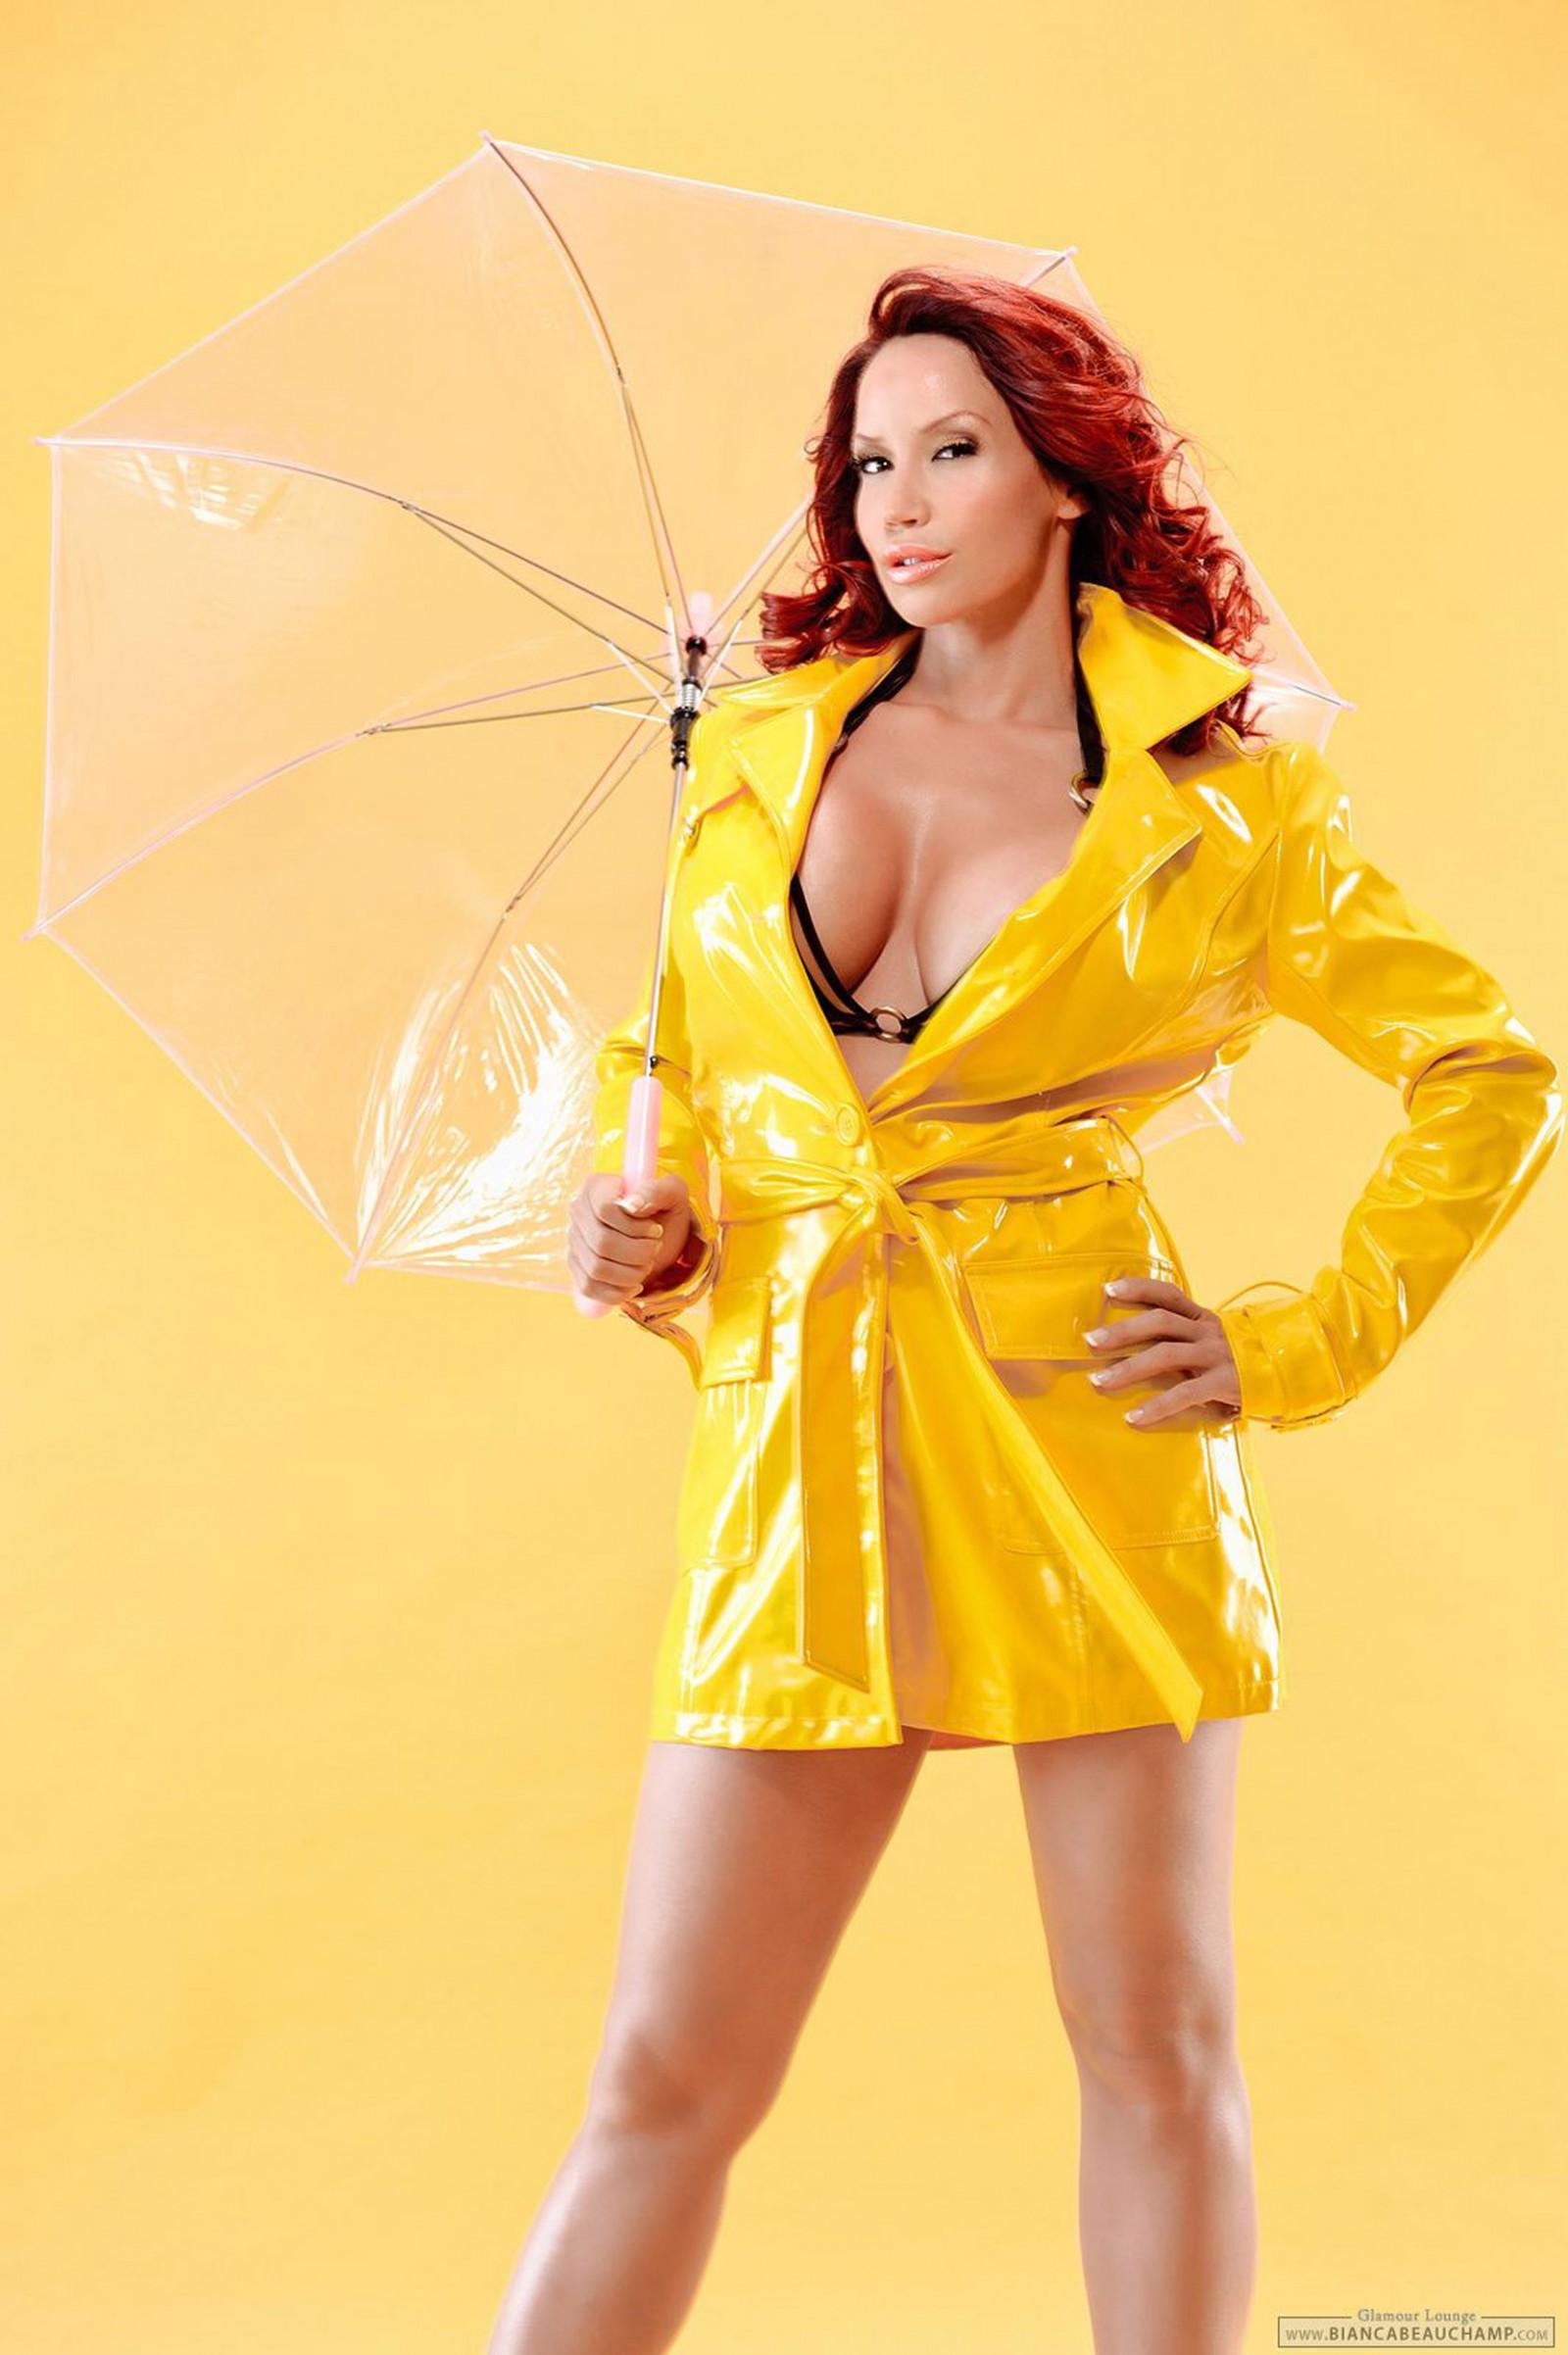 Wallpaper  Women, Redhead, Model, Simple Background, Big Boobs, Cleavage, Bikini -6918